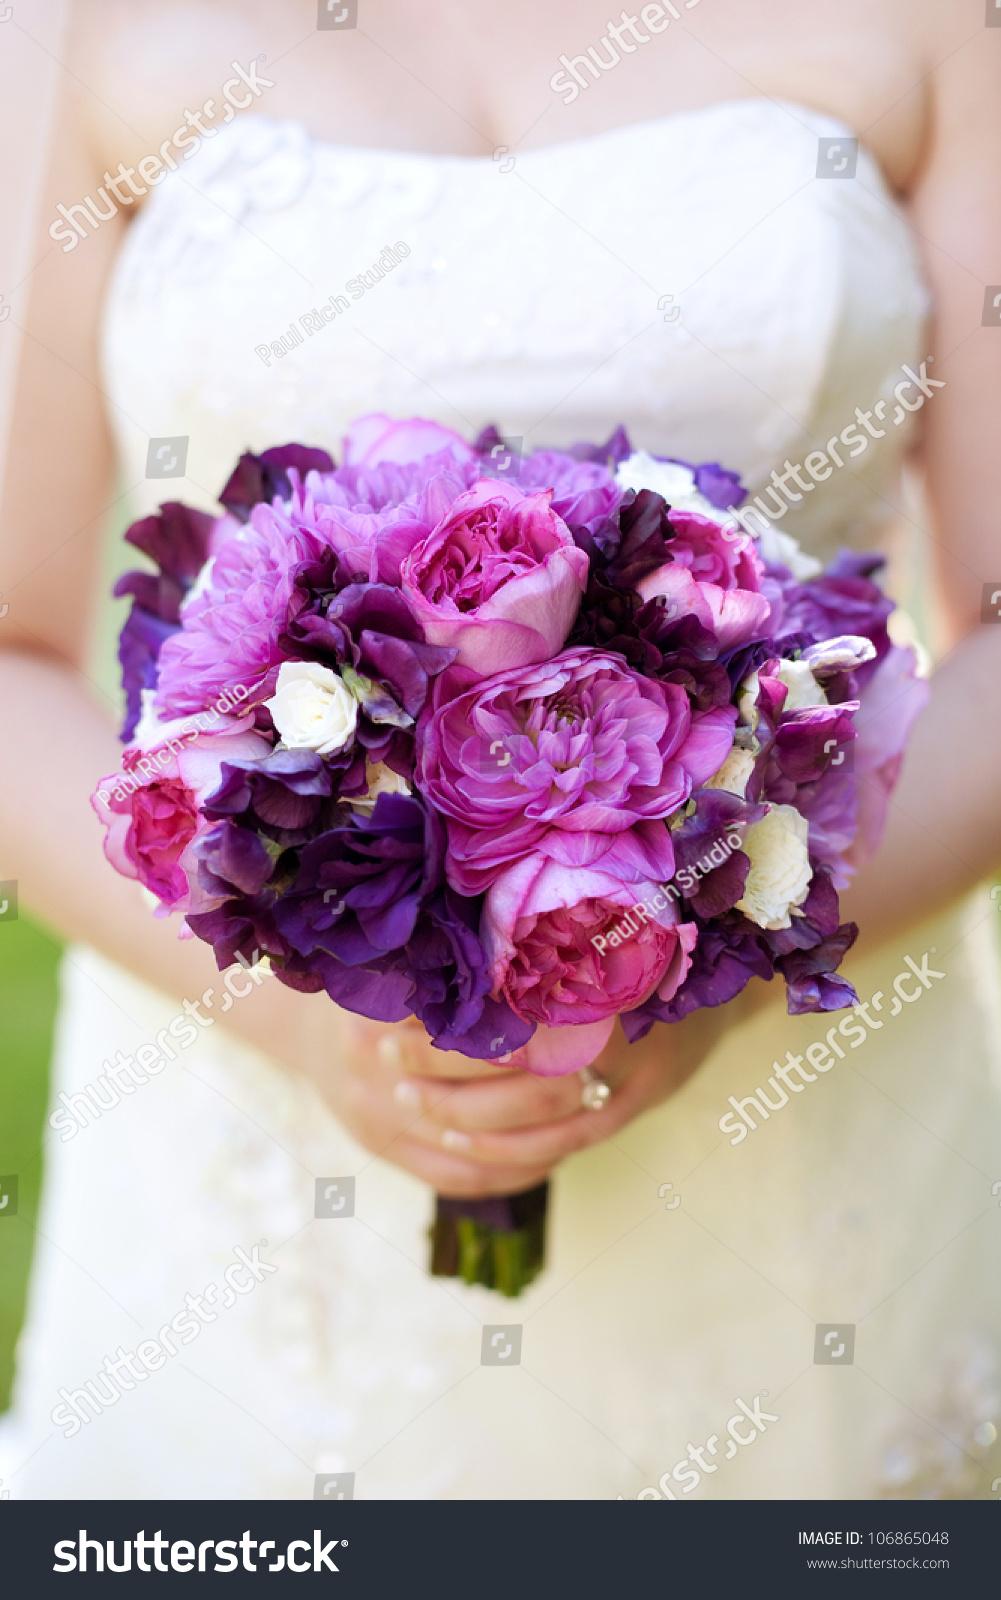 item brides maid pink purple bouquet